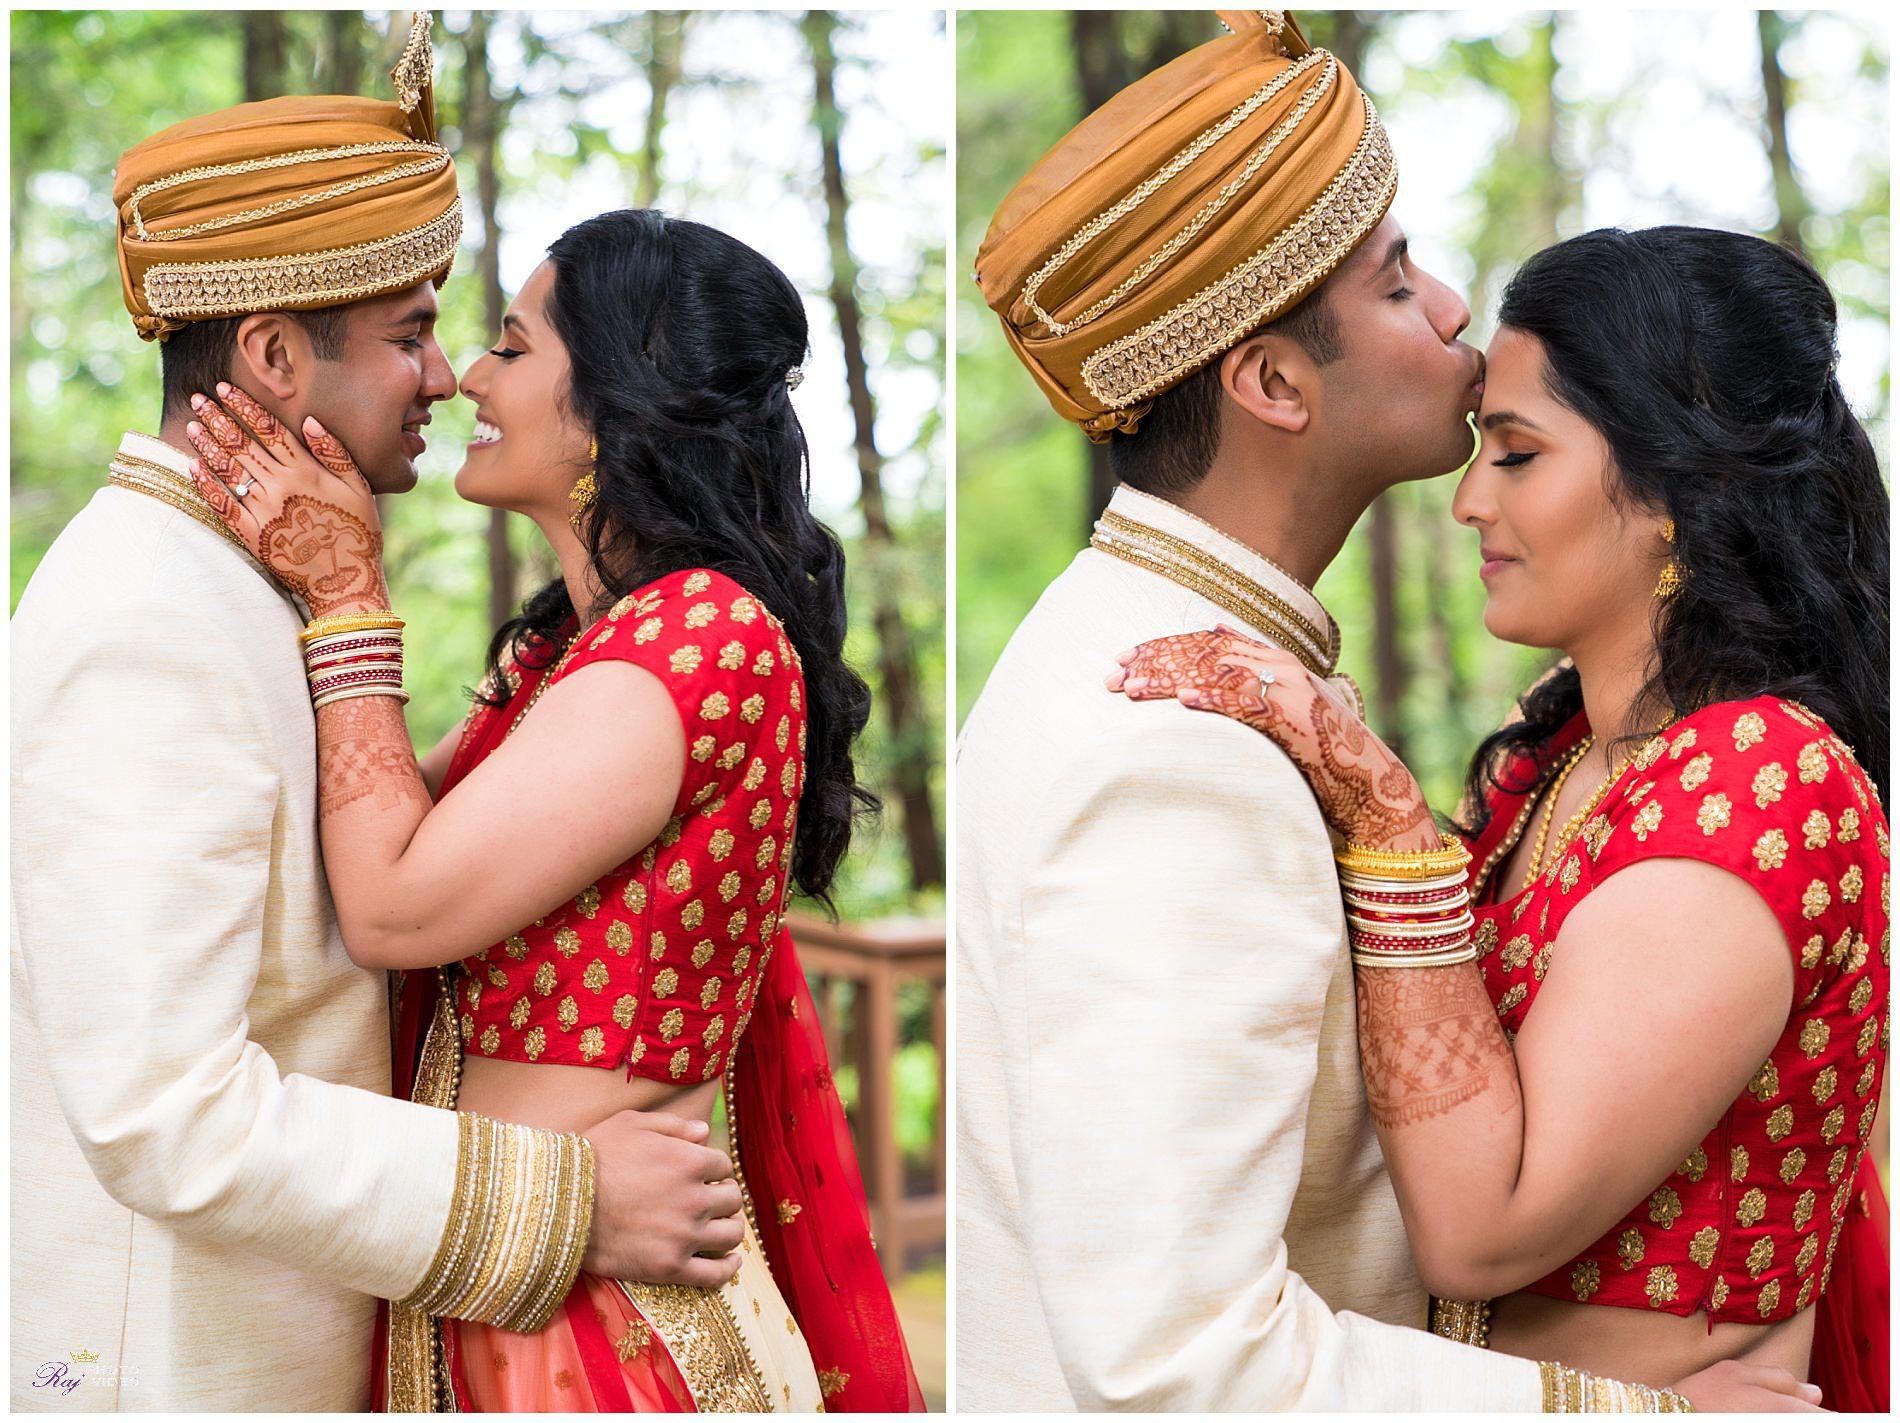 Martinsville-Gardens-NJ-Indian-Wedding-Ruchi-Vishal-11.jpg